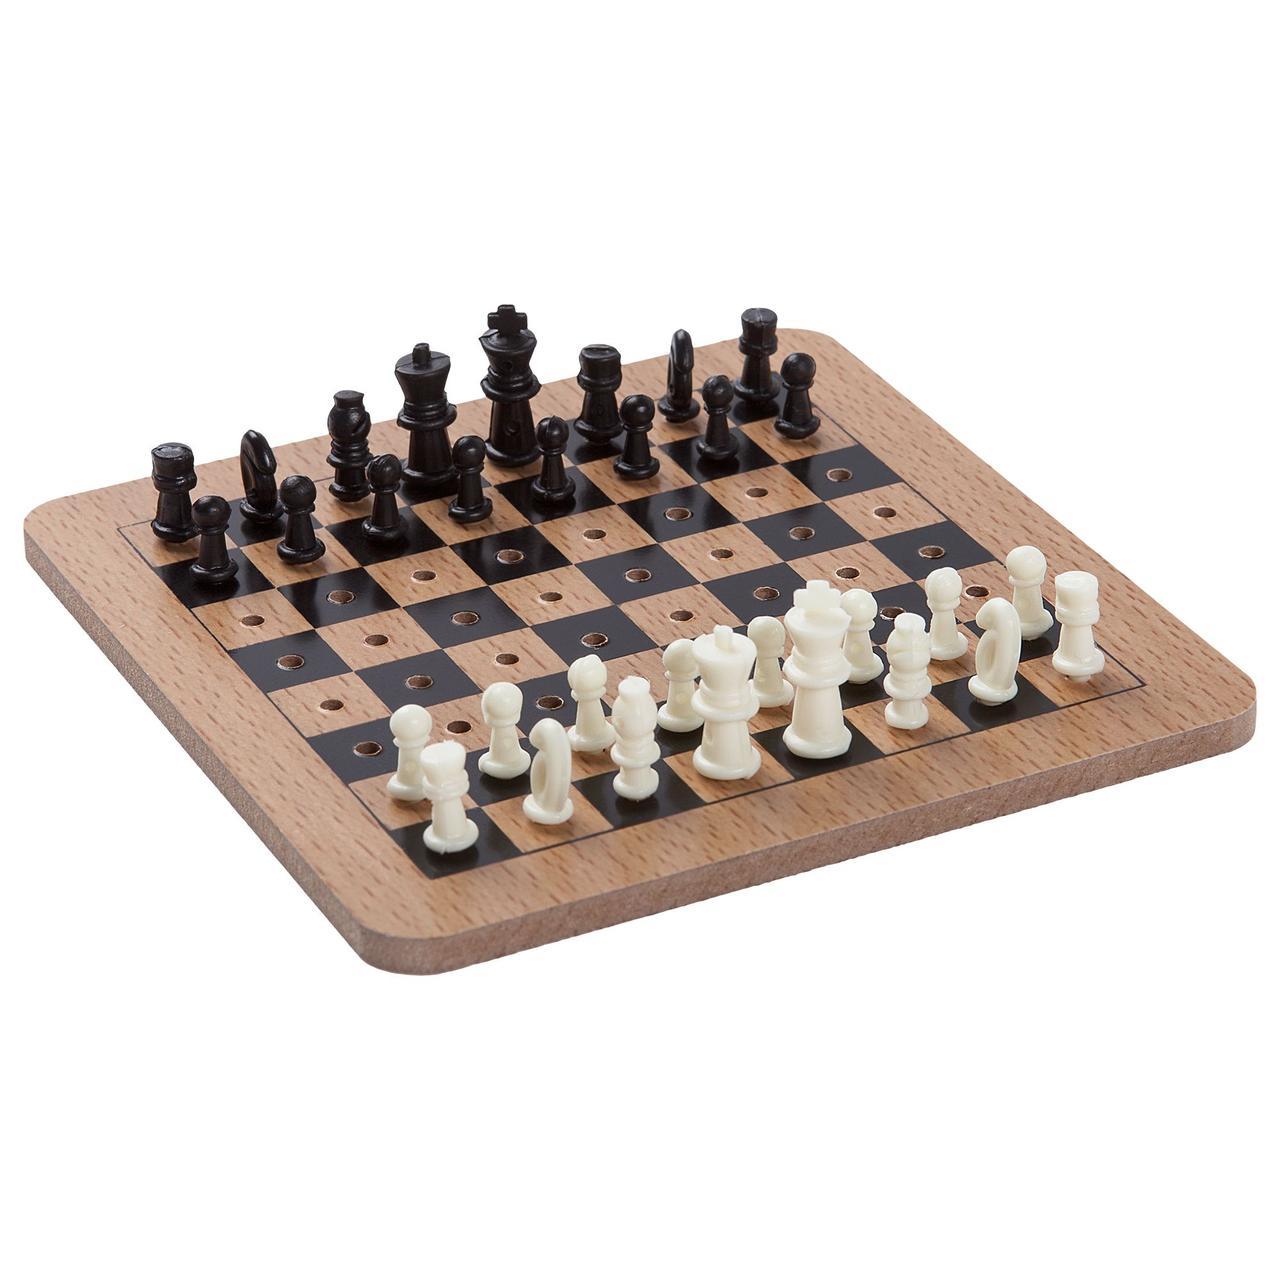 Шахматы дорожные Damier (артикул 3446.30)